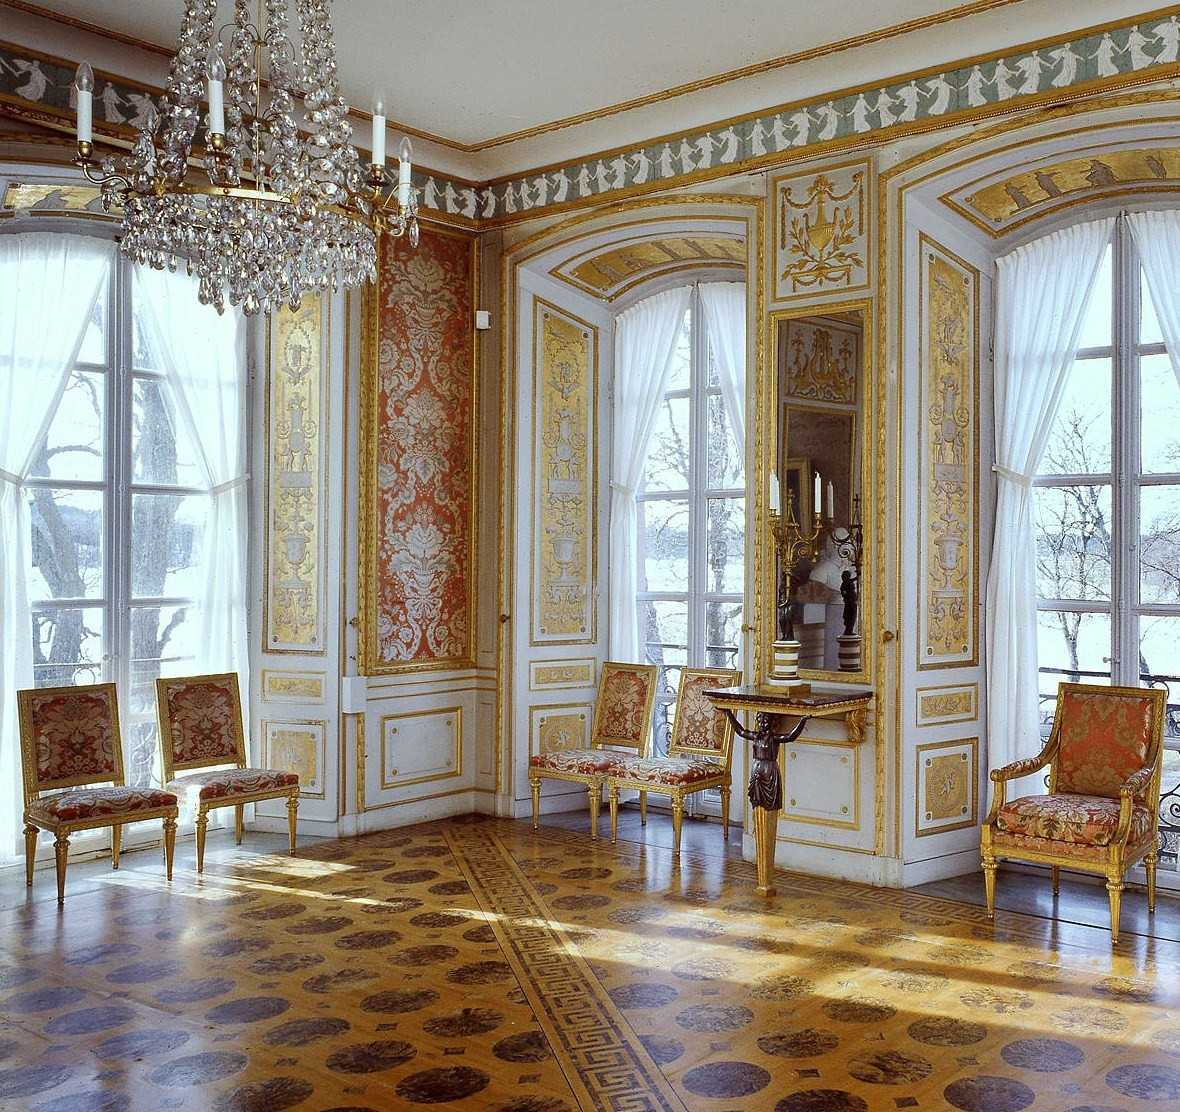 Interior ruangan yang mewah (Sumber: pinterest.com)